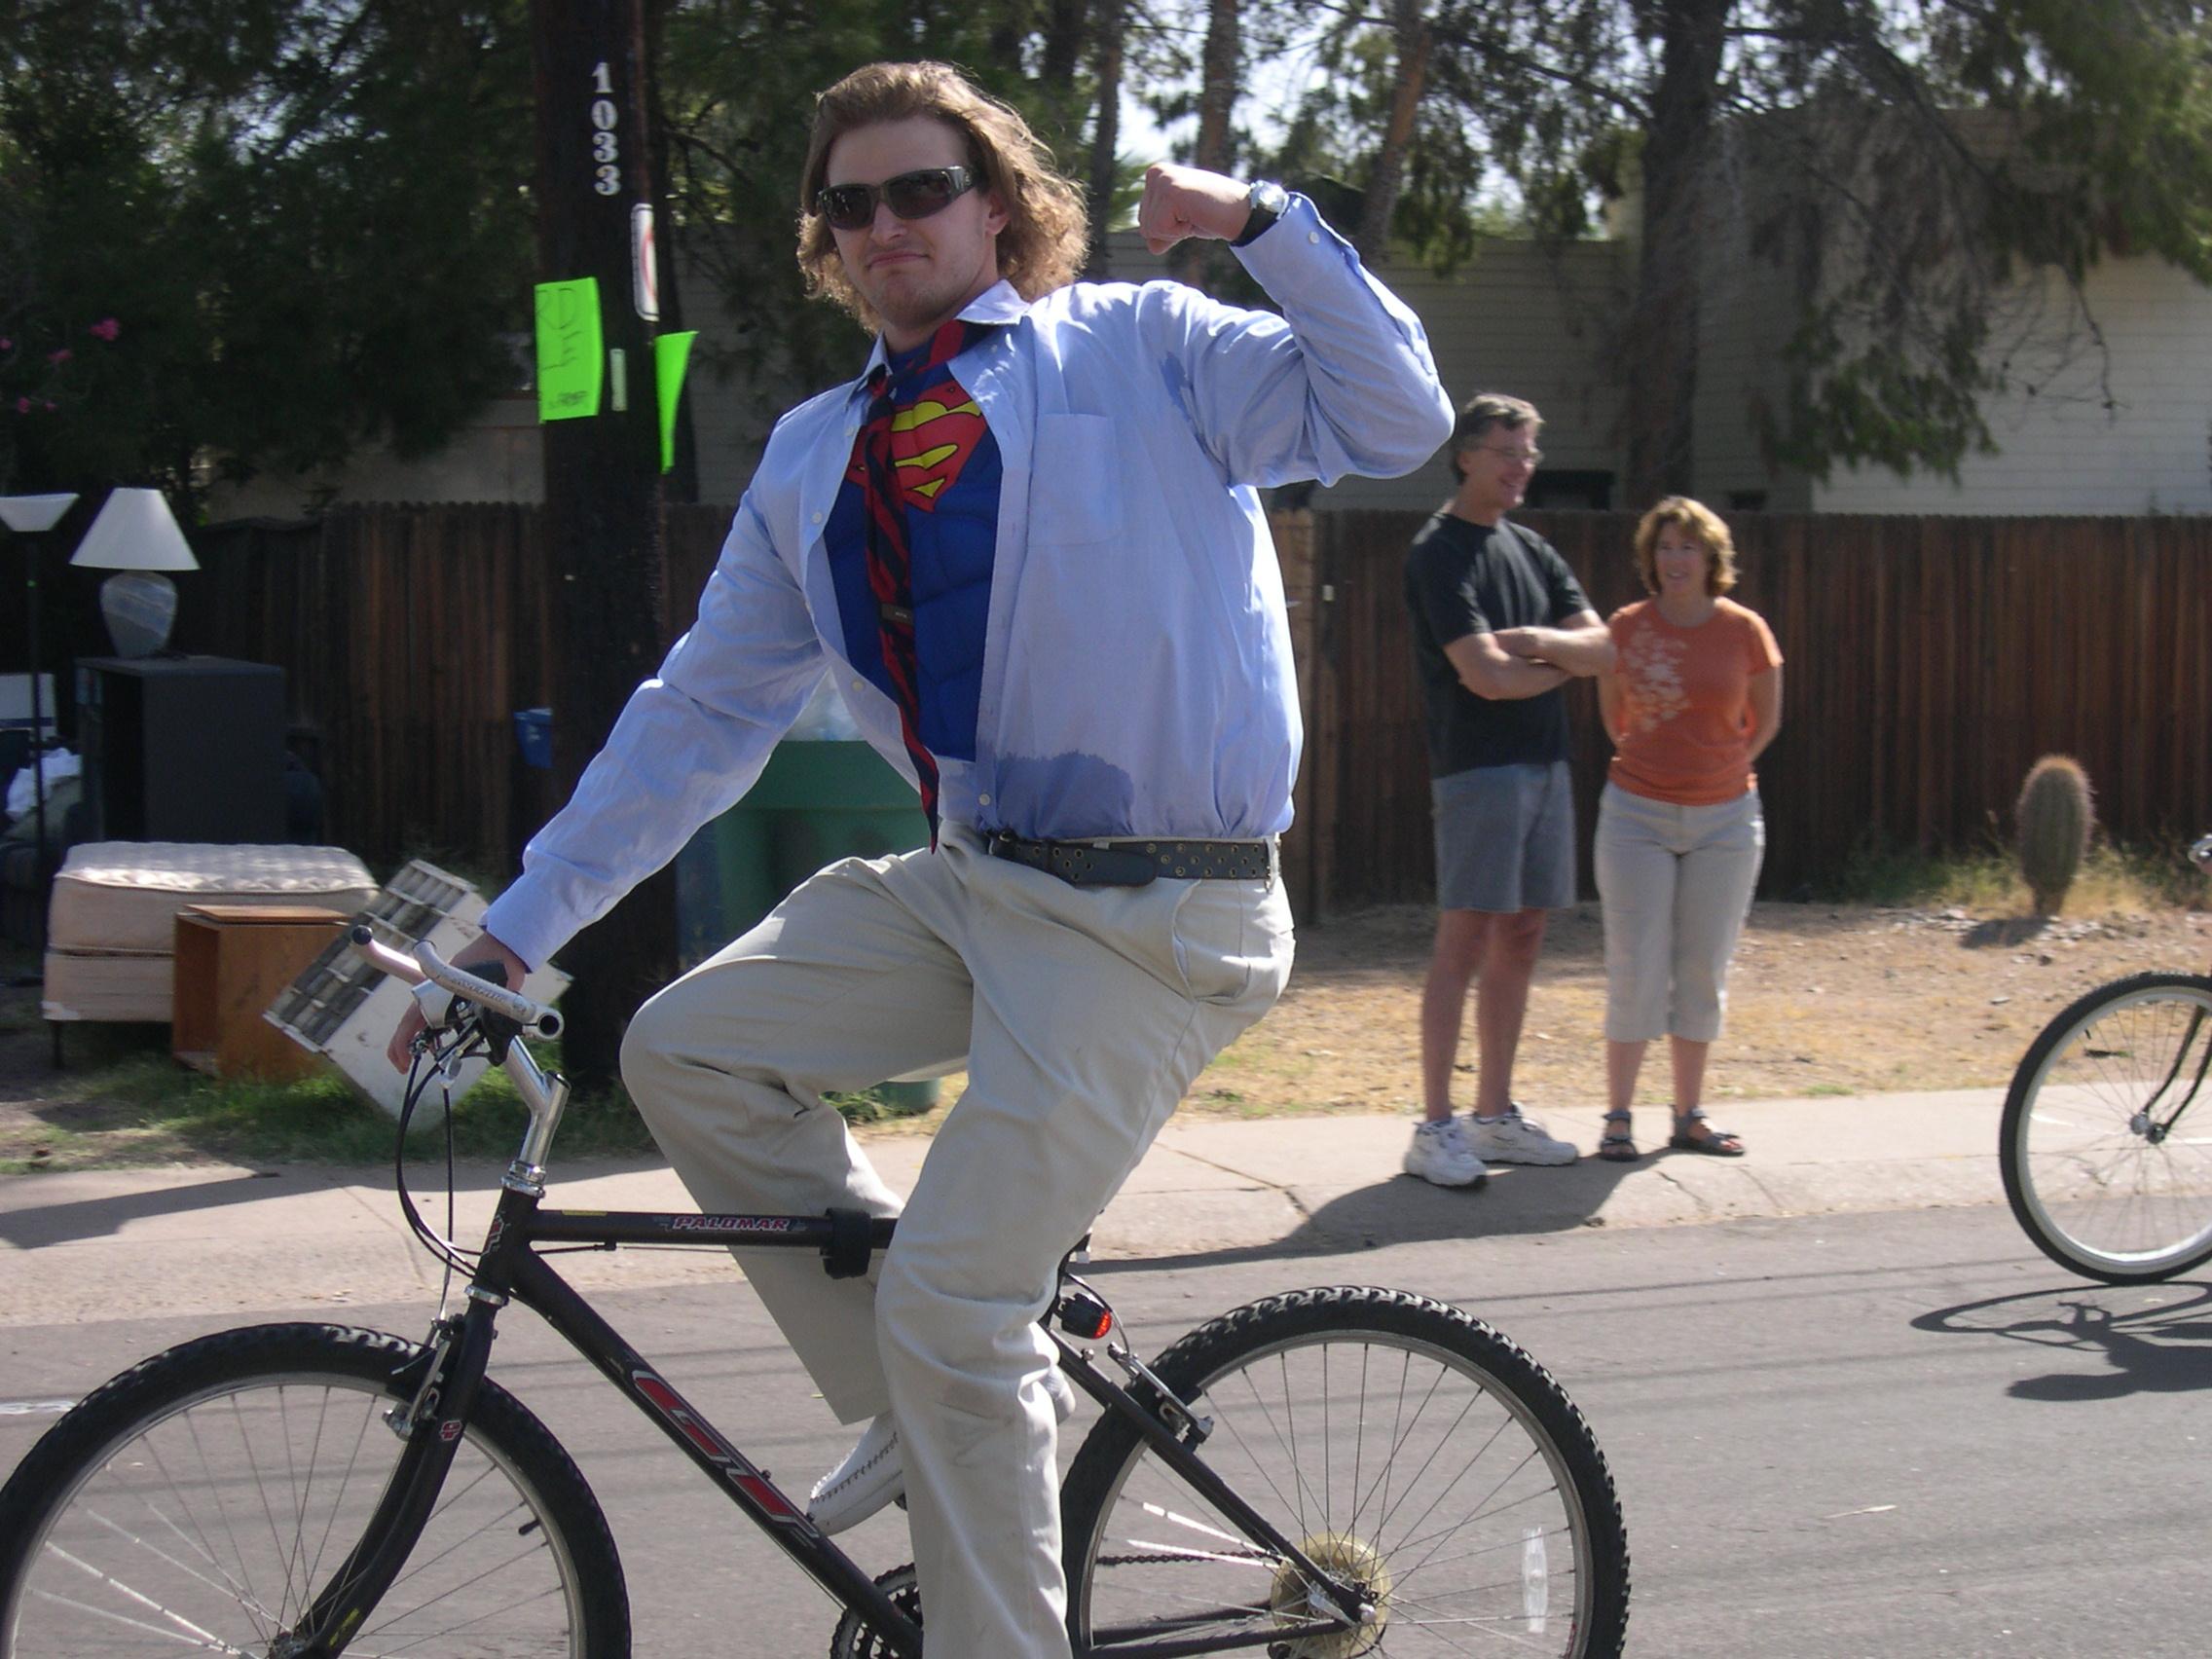 Bike parade photo